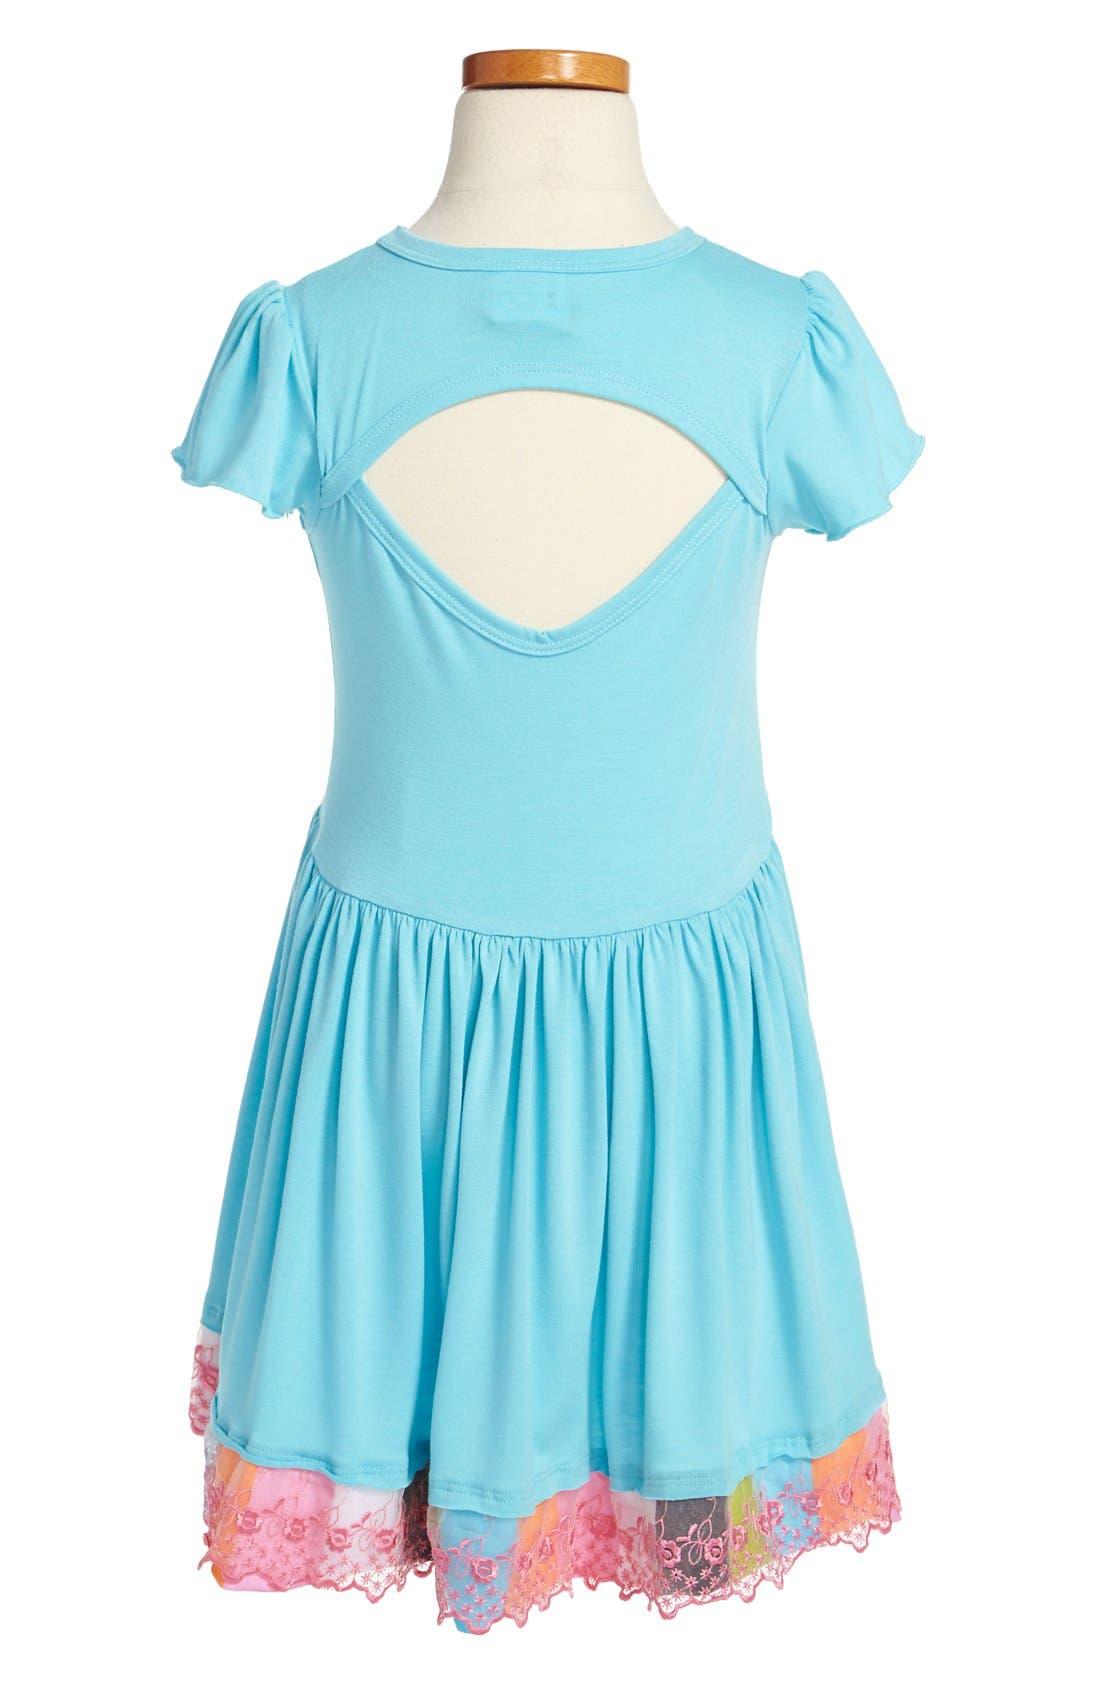 Alternate Image 2  - Twirls & Twigs Contrast Ruffle Dress (Little Girls & Big Girls)